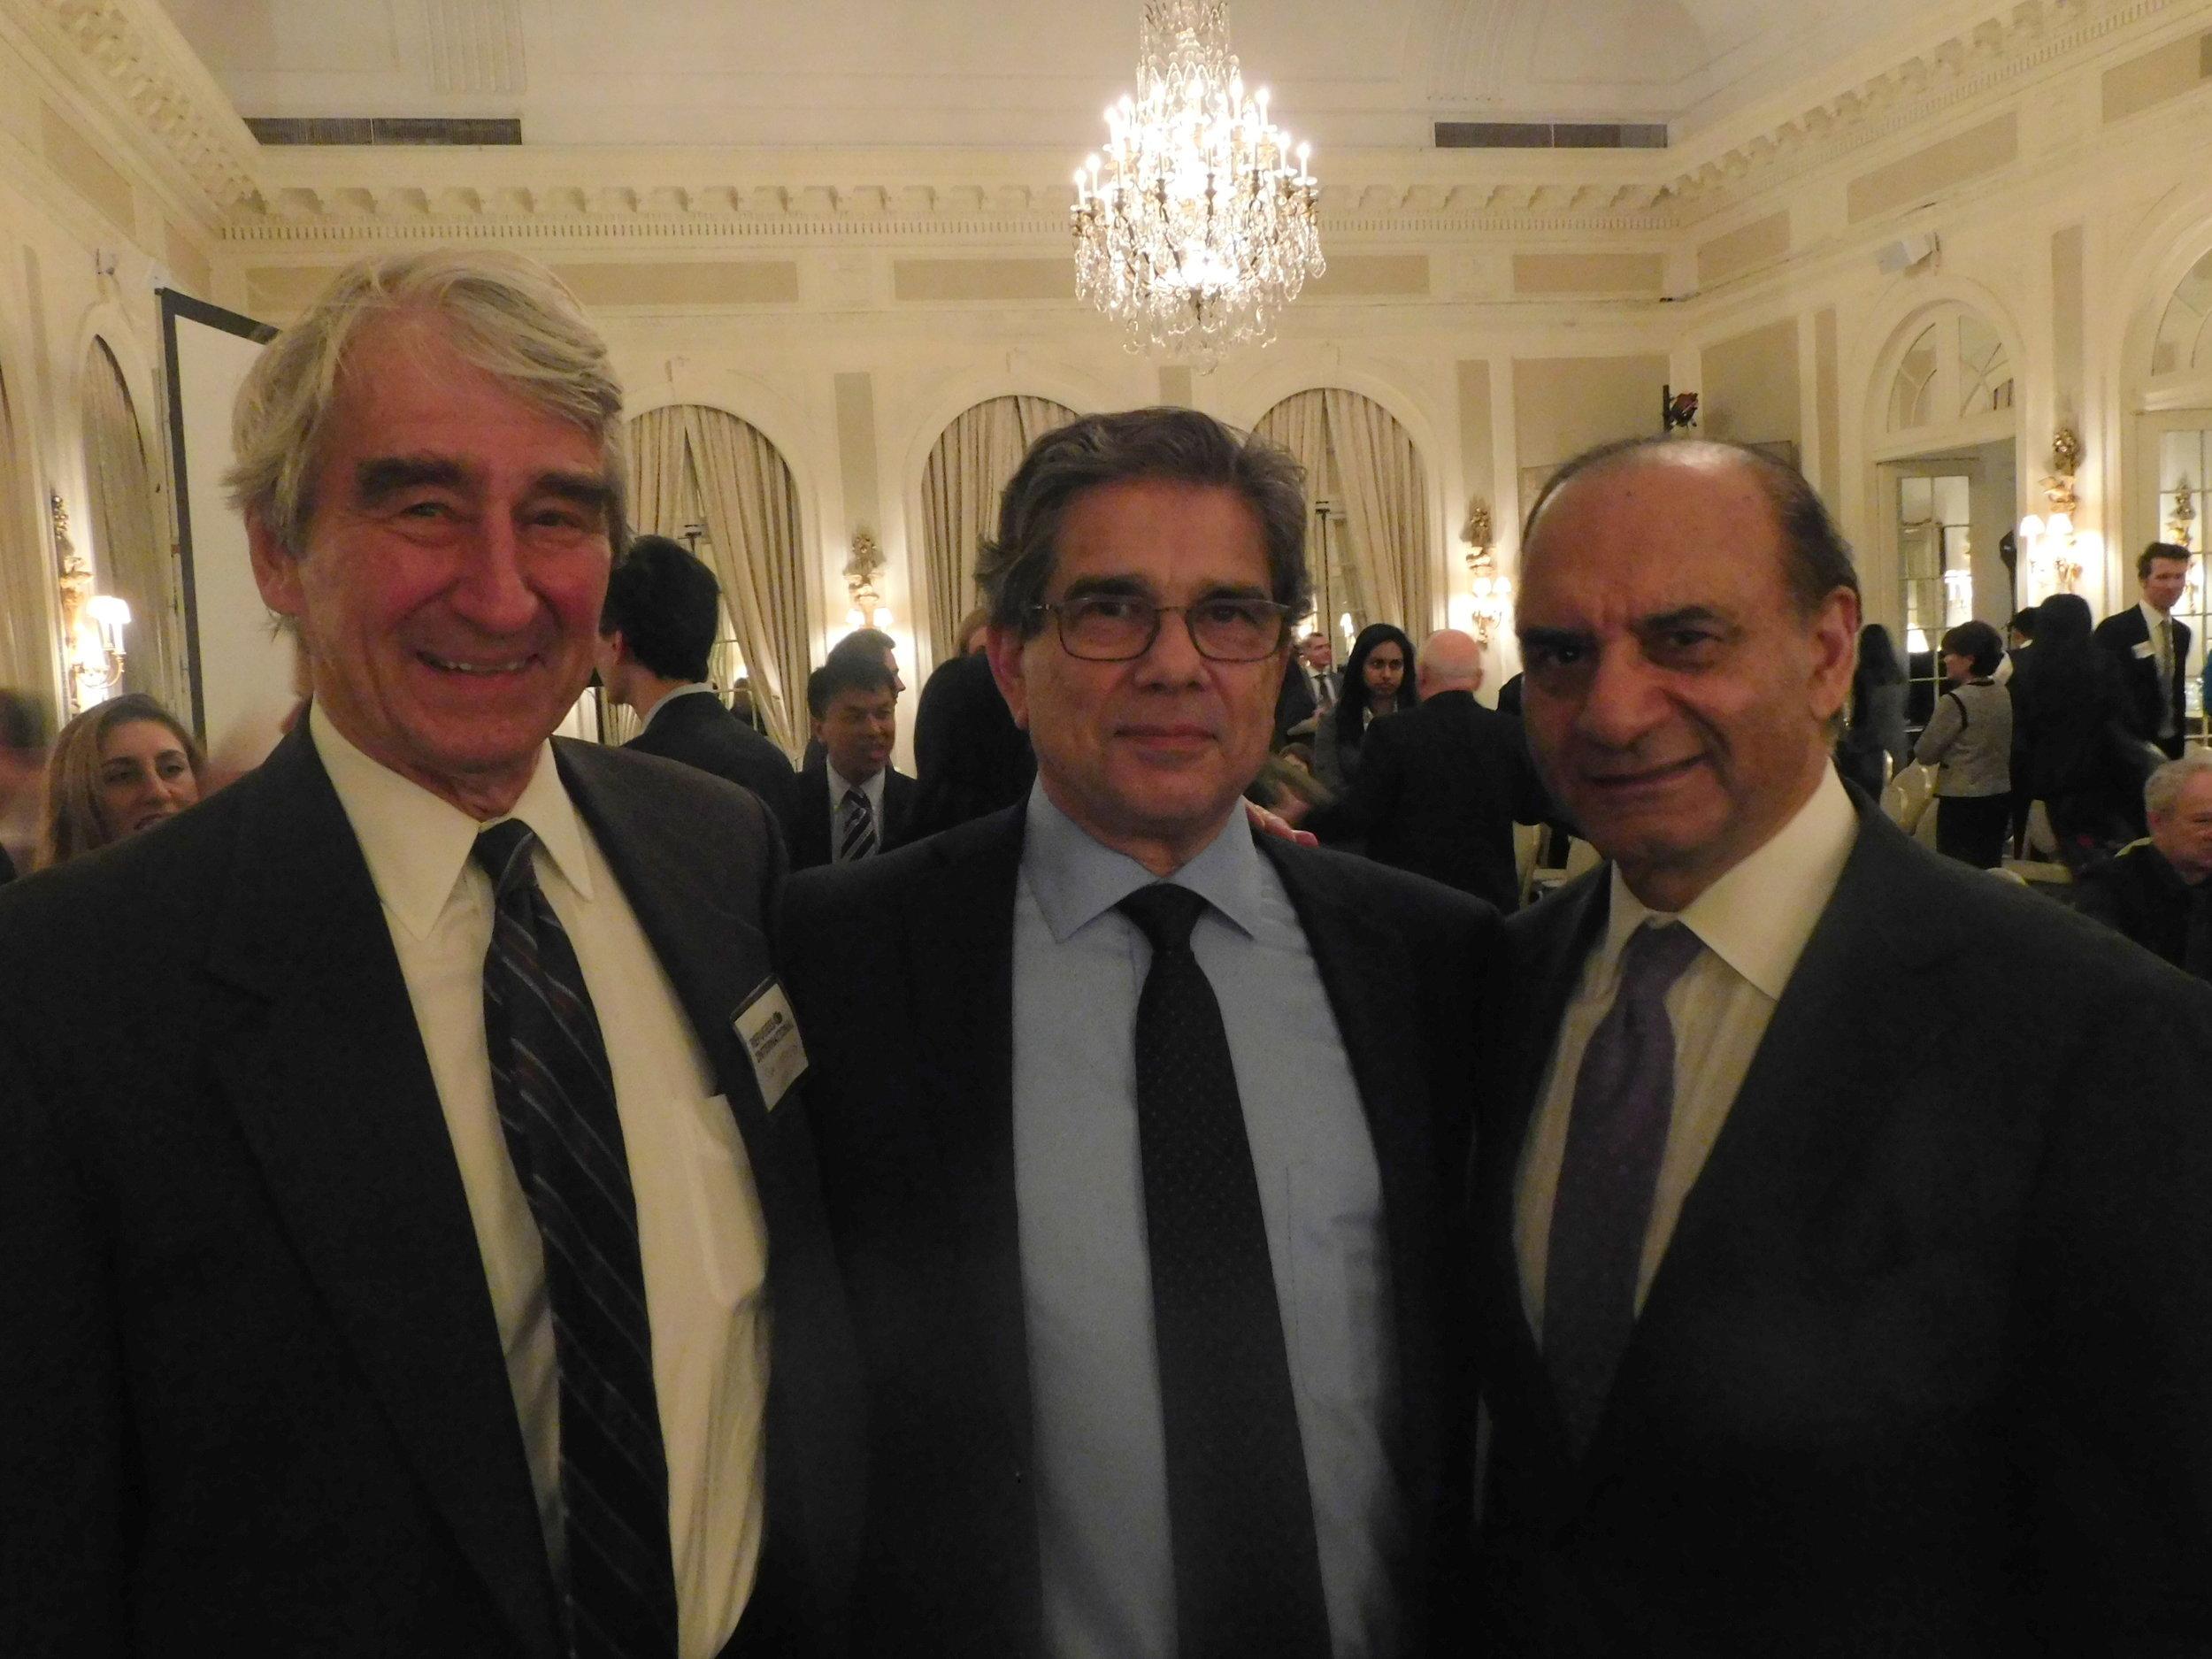 RI Director Emeritus Sam Waterston, RI President Michel Gabaudan, RI Chair Emeritus Farooq Kathwari.